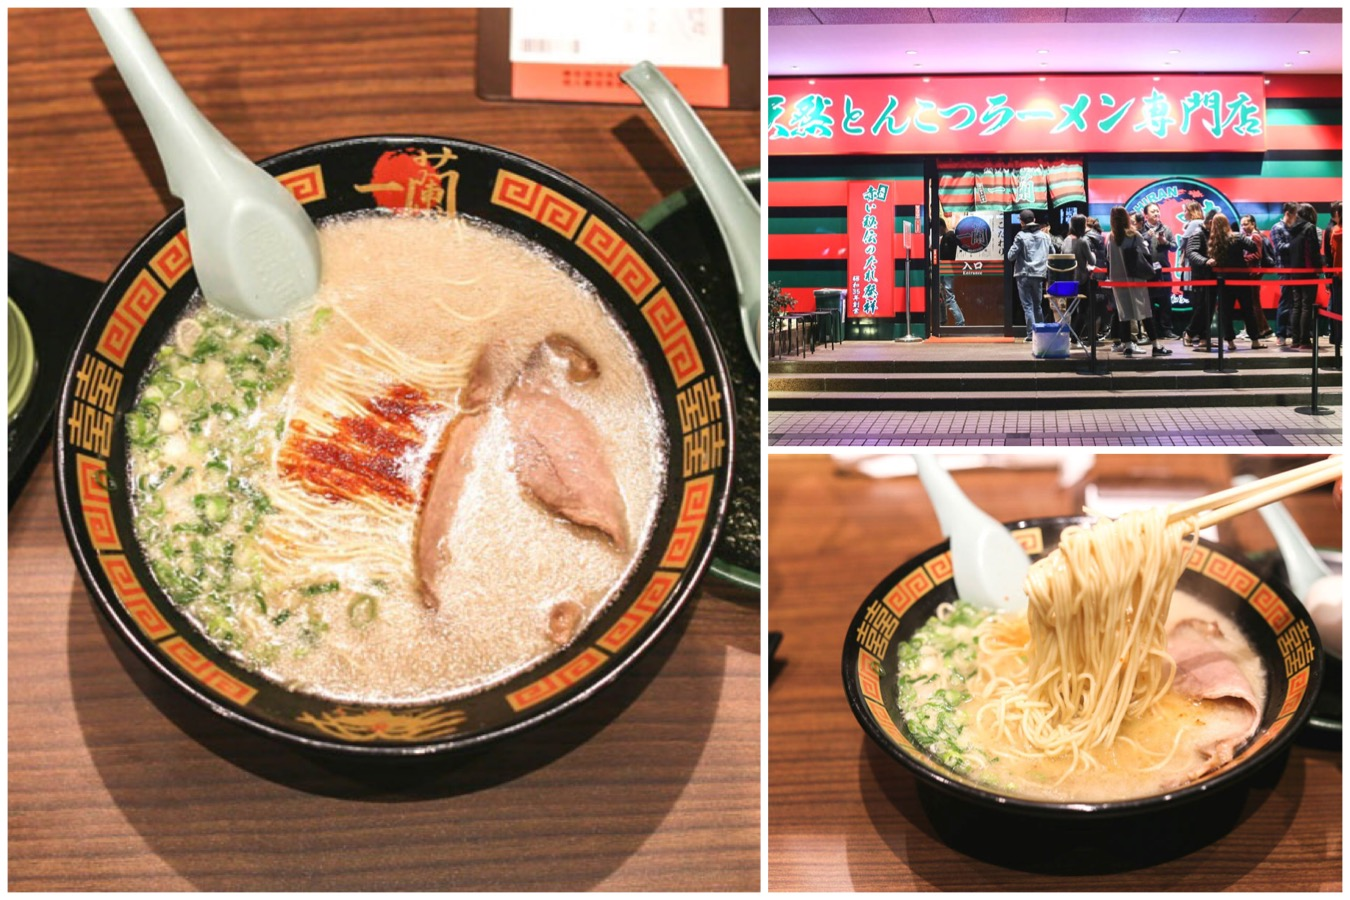 Ichiran Ramen 一蘭拉麵 - Famous Ramen Restaurant In Taipei, Opens 24/7